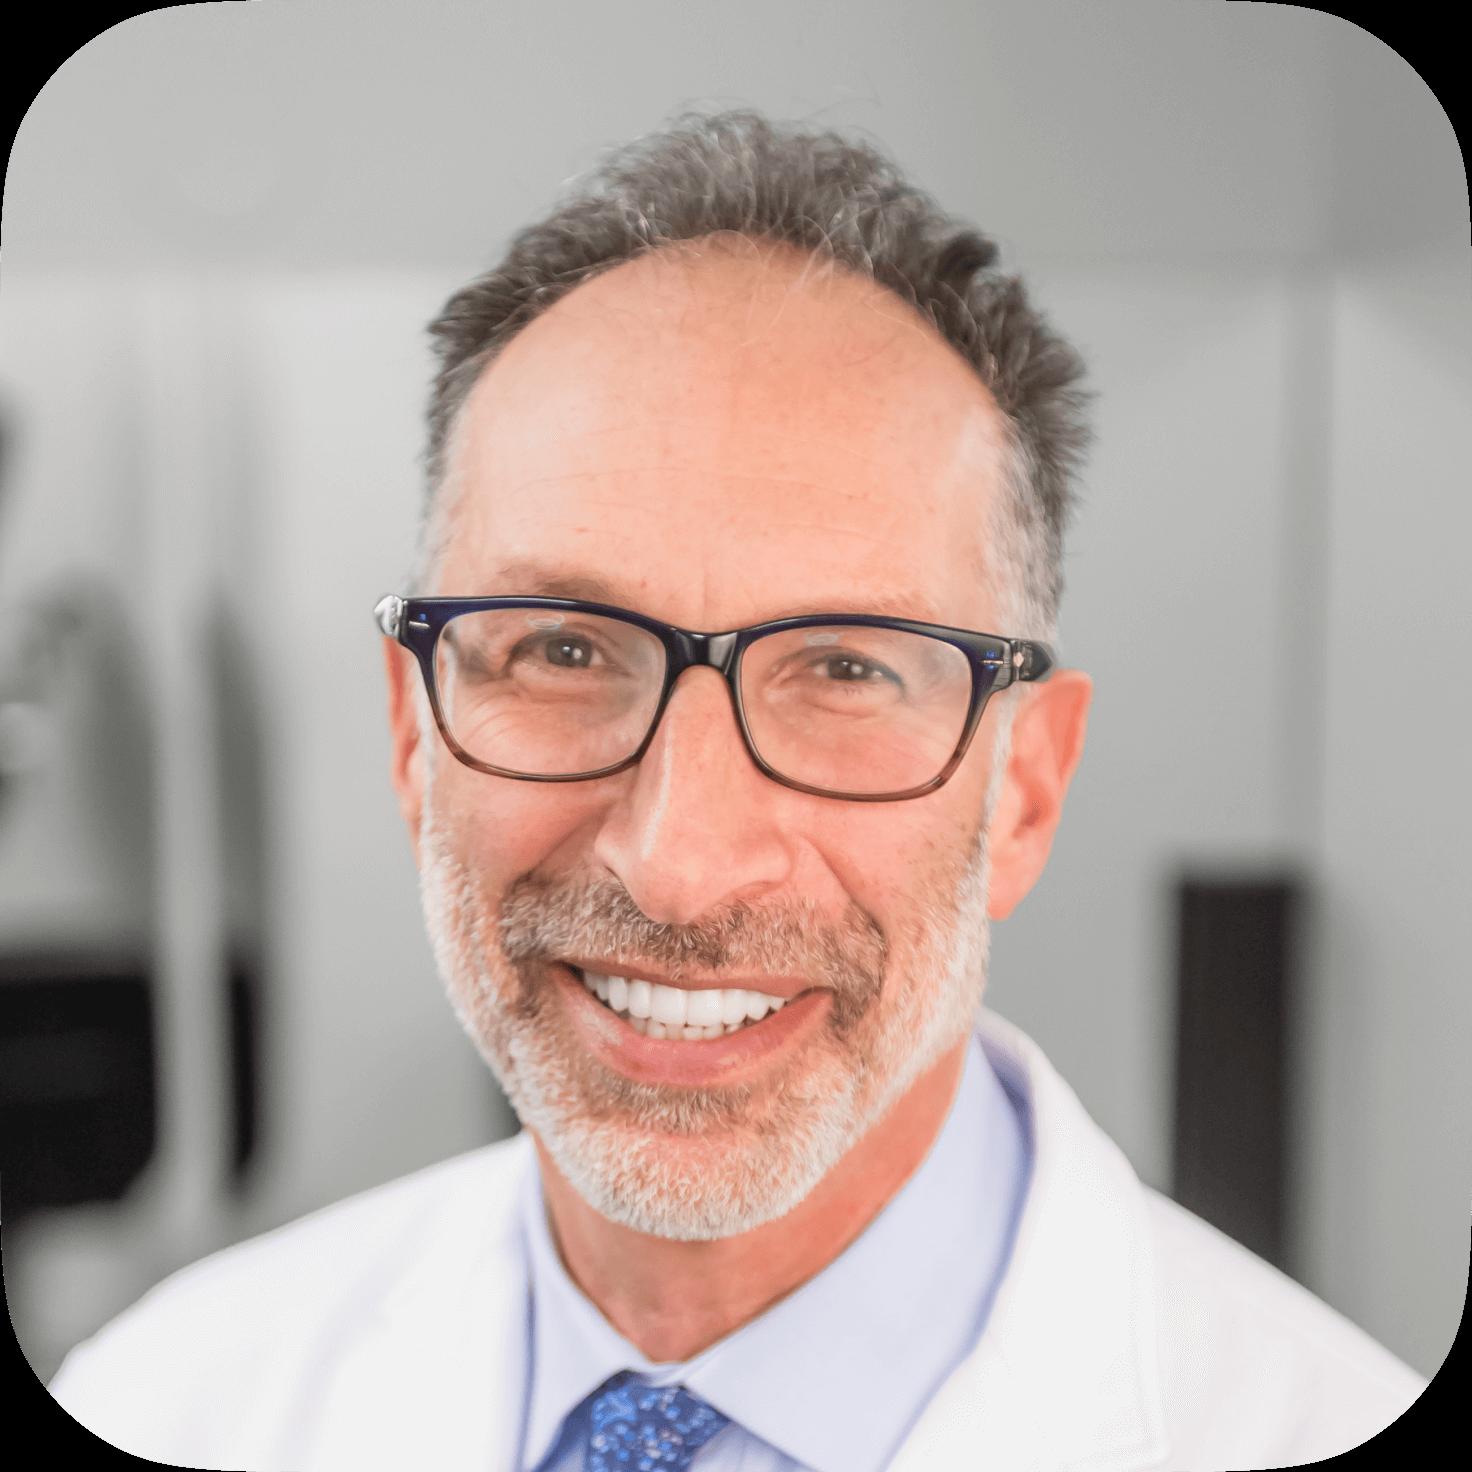 Dr. Daniel Fenster, DC